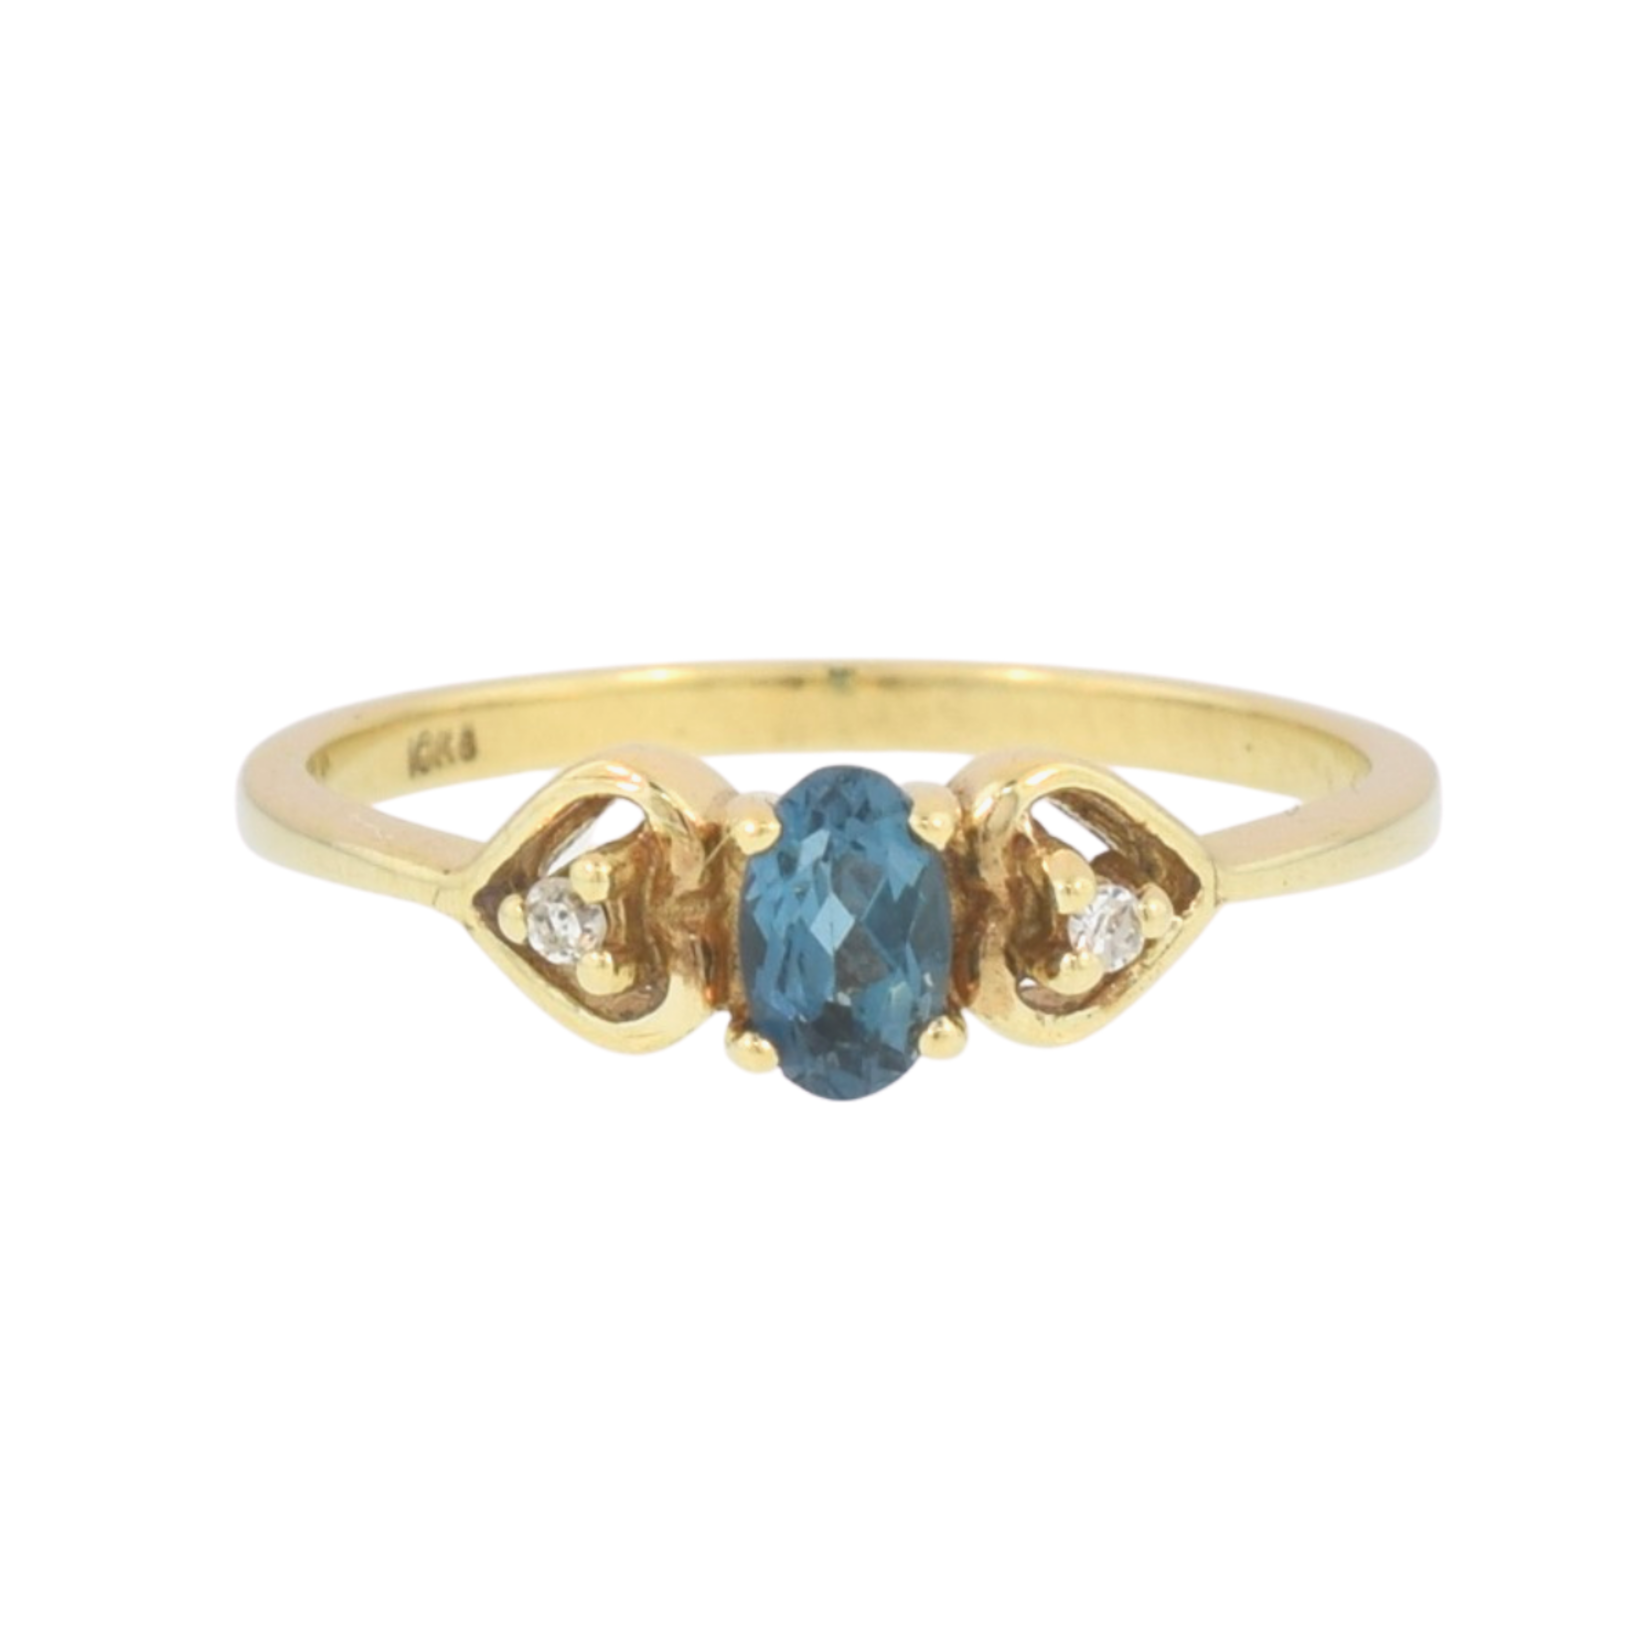 Estate/ 10KY/ Heart Design/ Oval Blue Stone/ 2 Dia